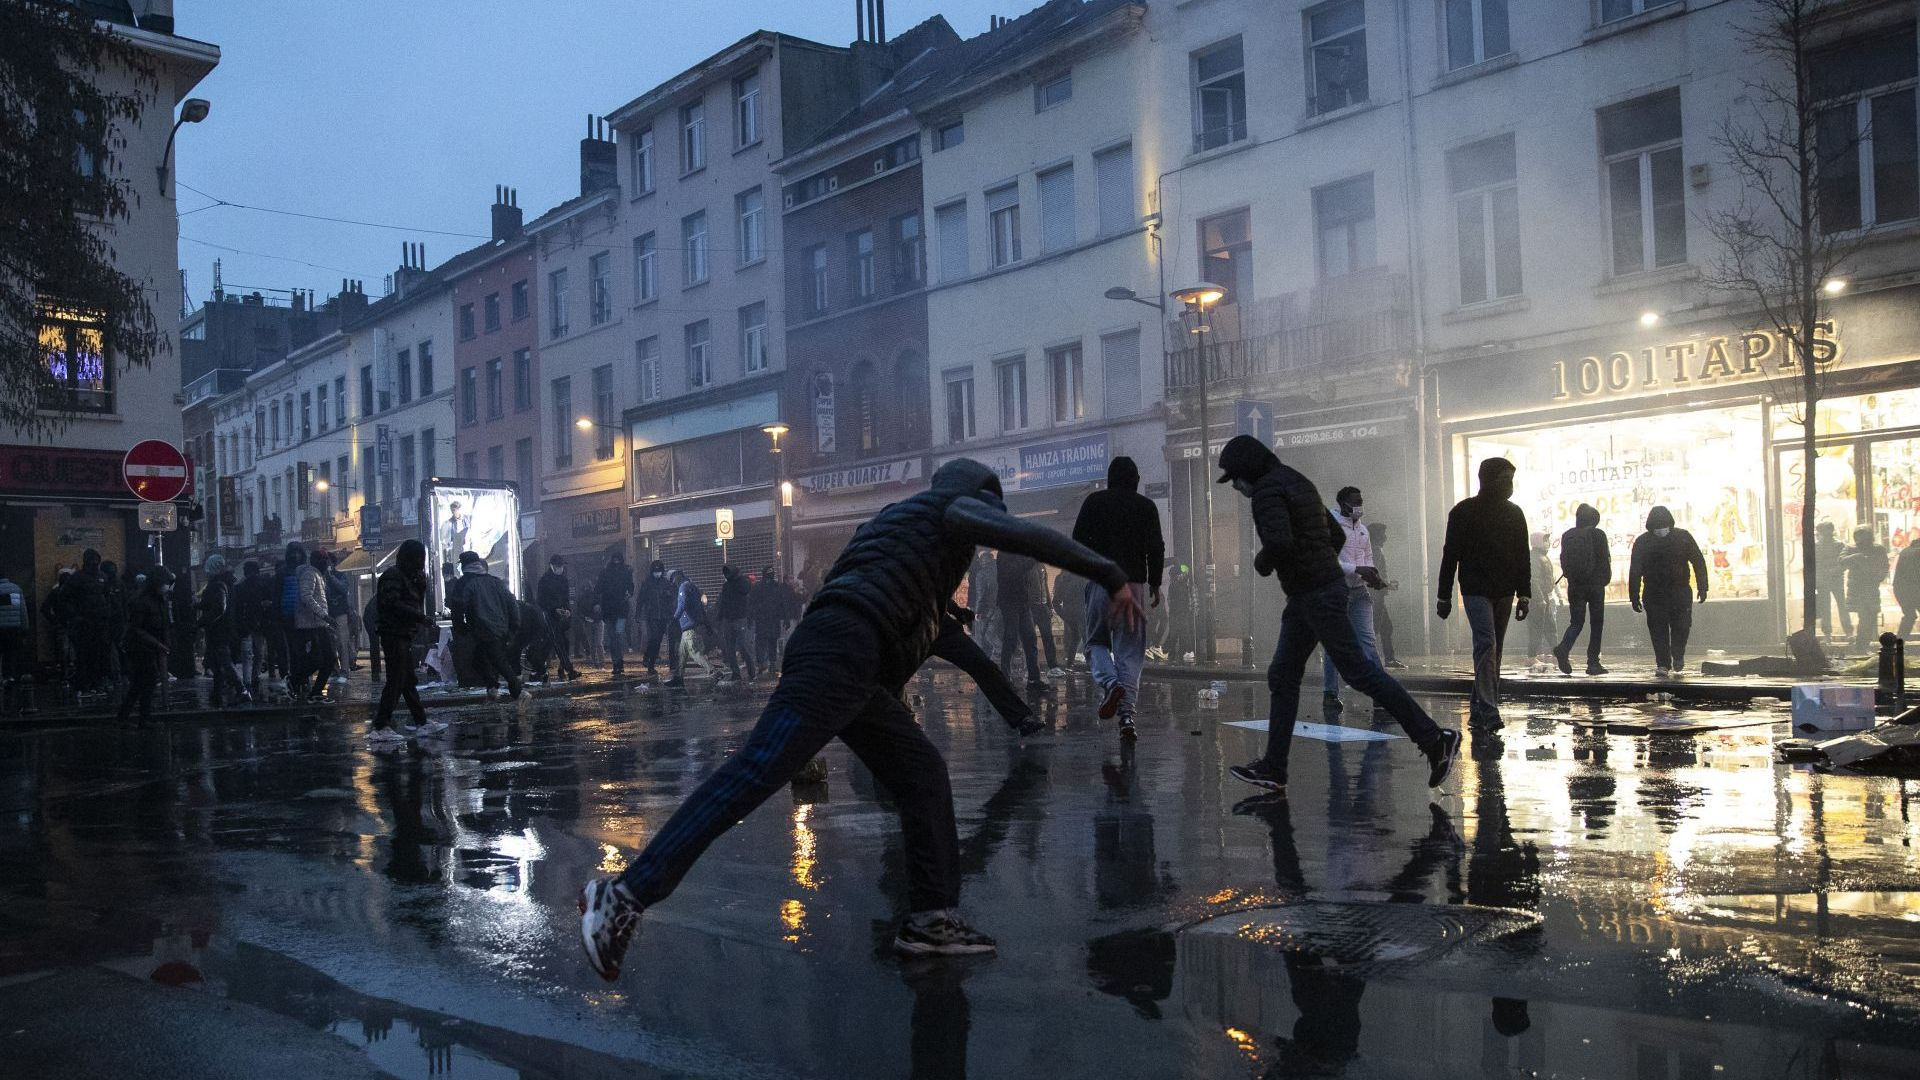 Протести и безредици в Брюксел, над 100 арестувани (снимки/видео)